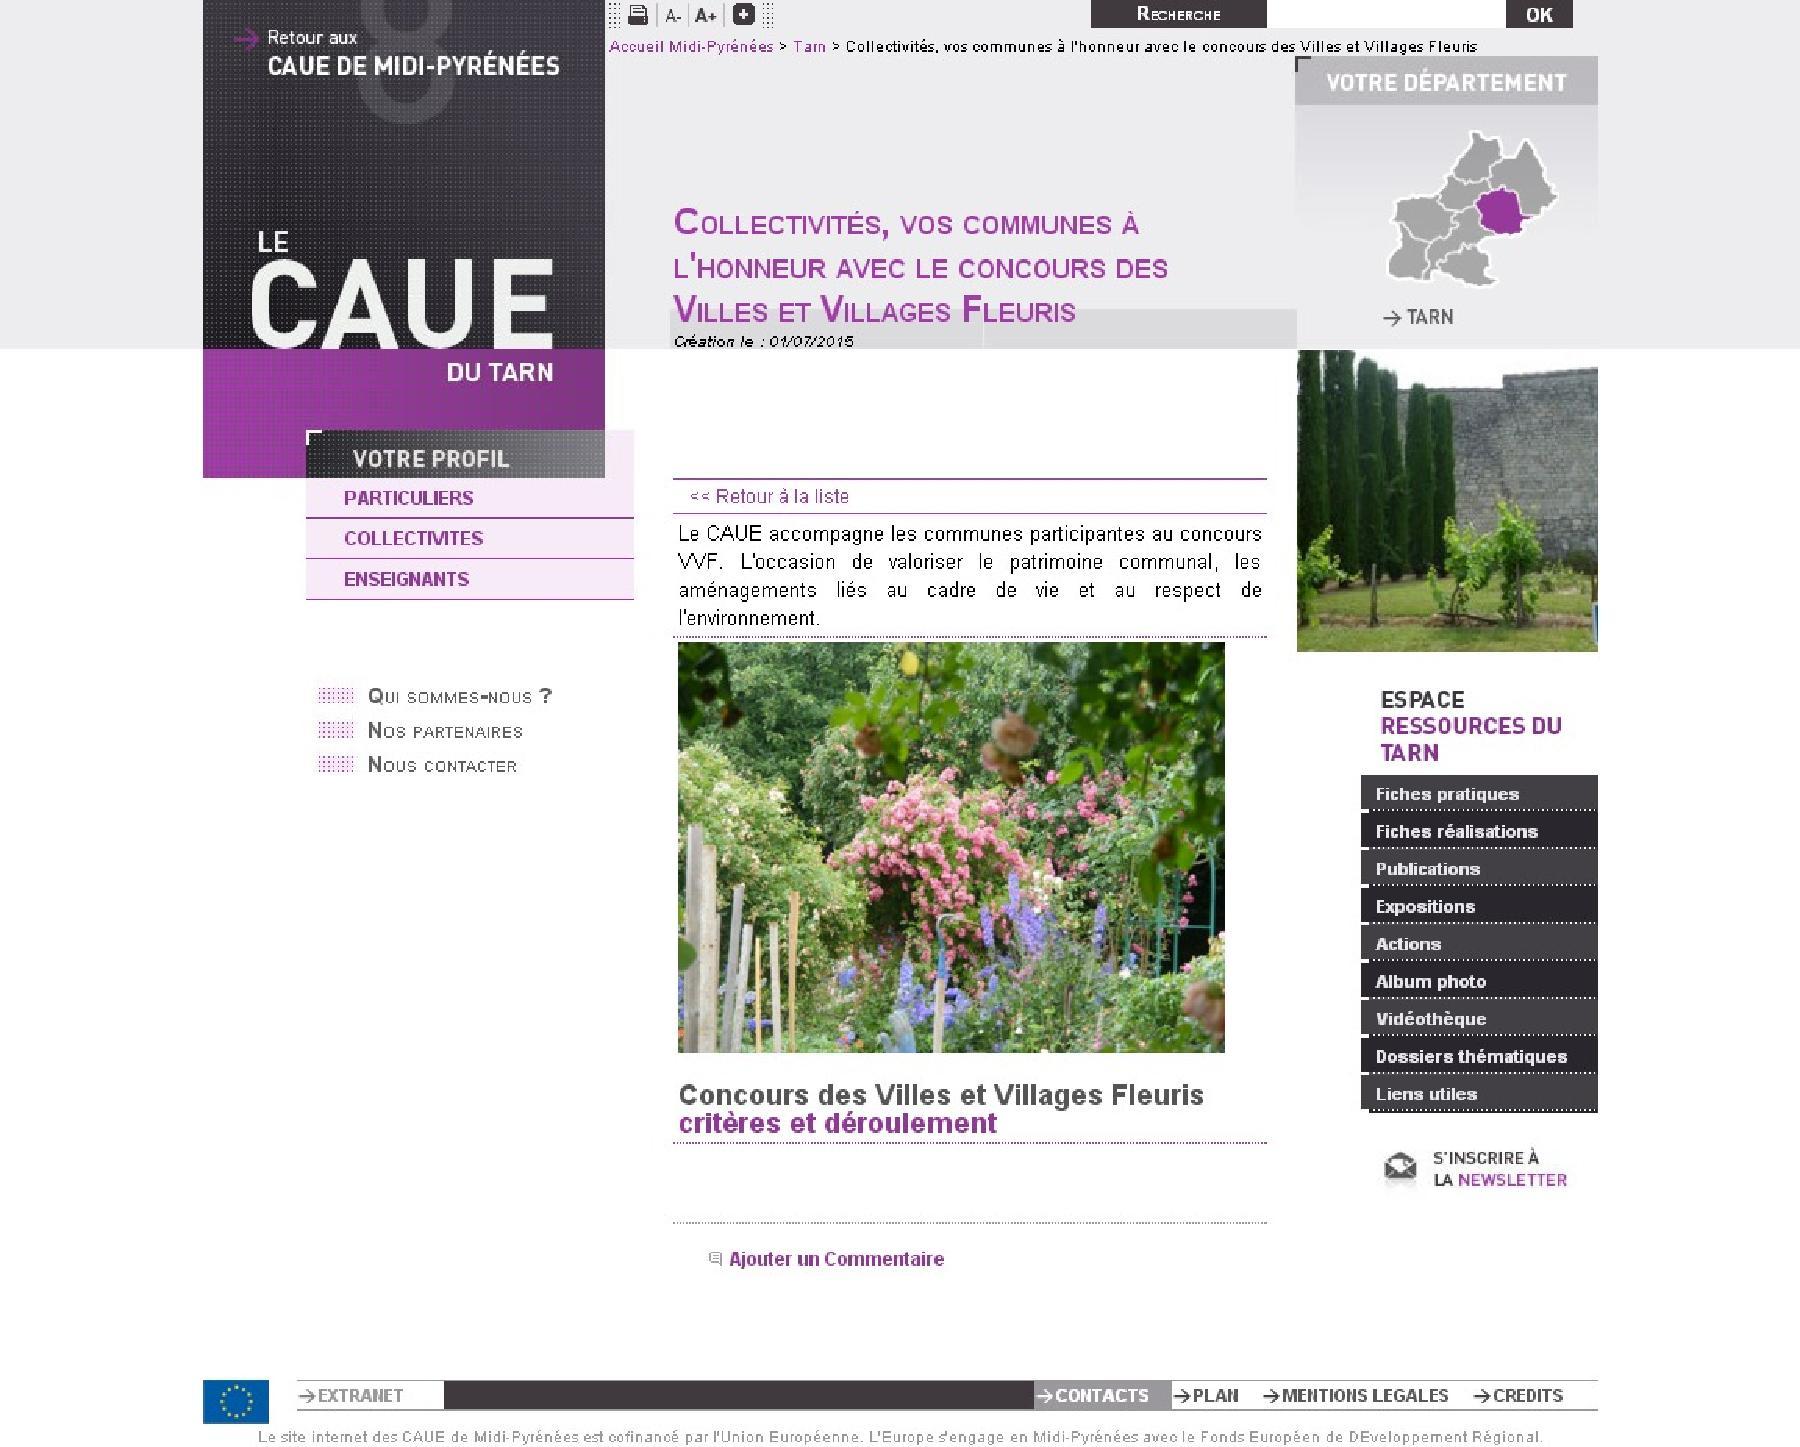 www.caue-mp.fr_81-tarn villages fleuris-page-001.jpg